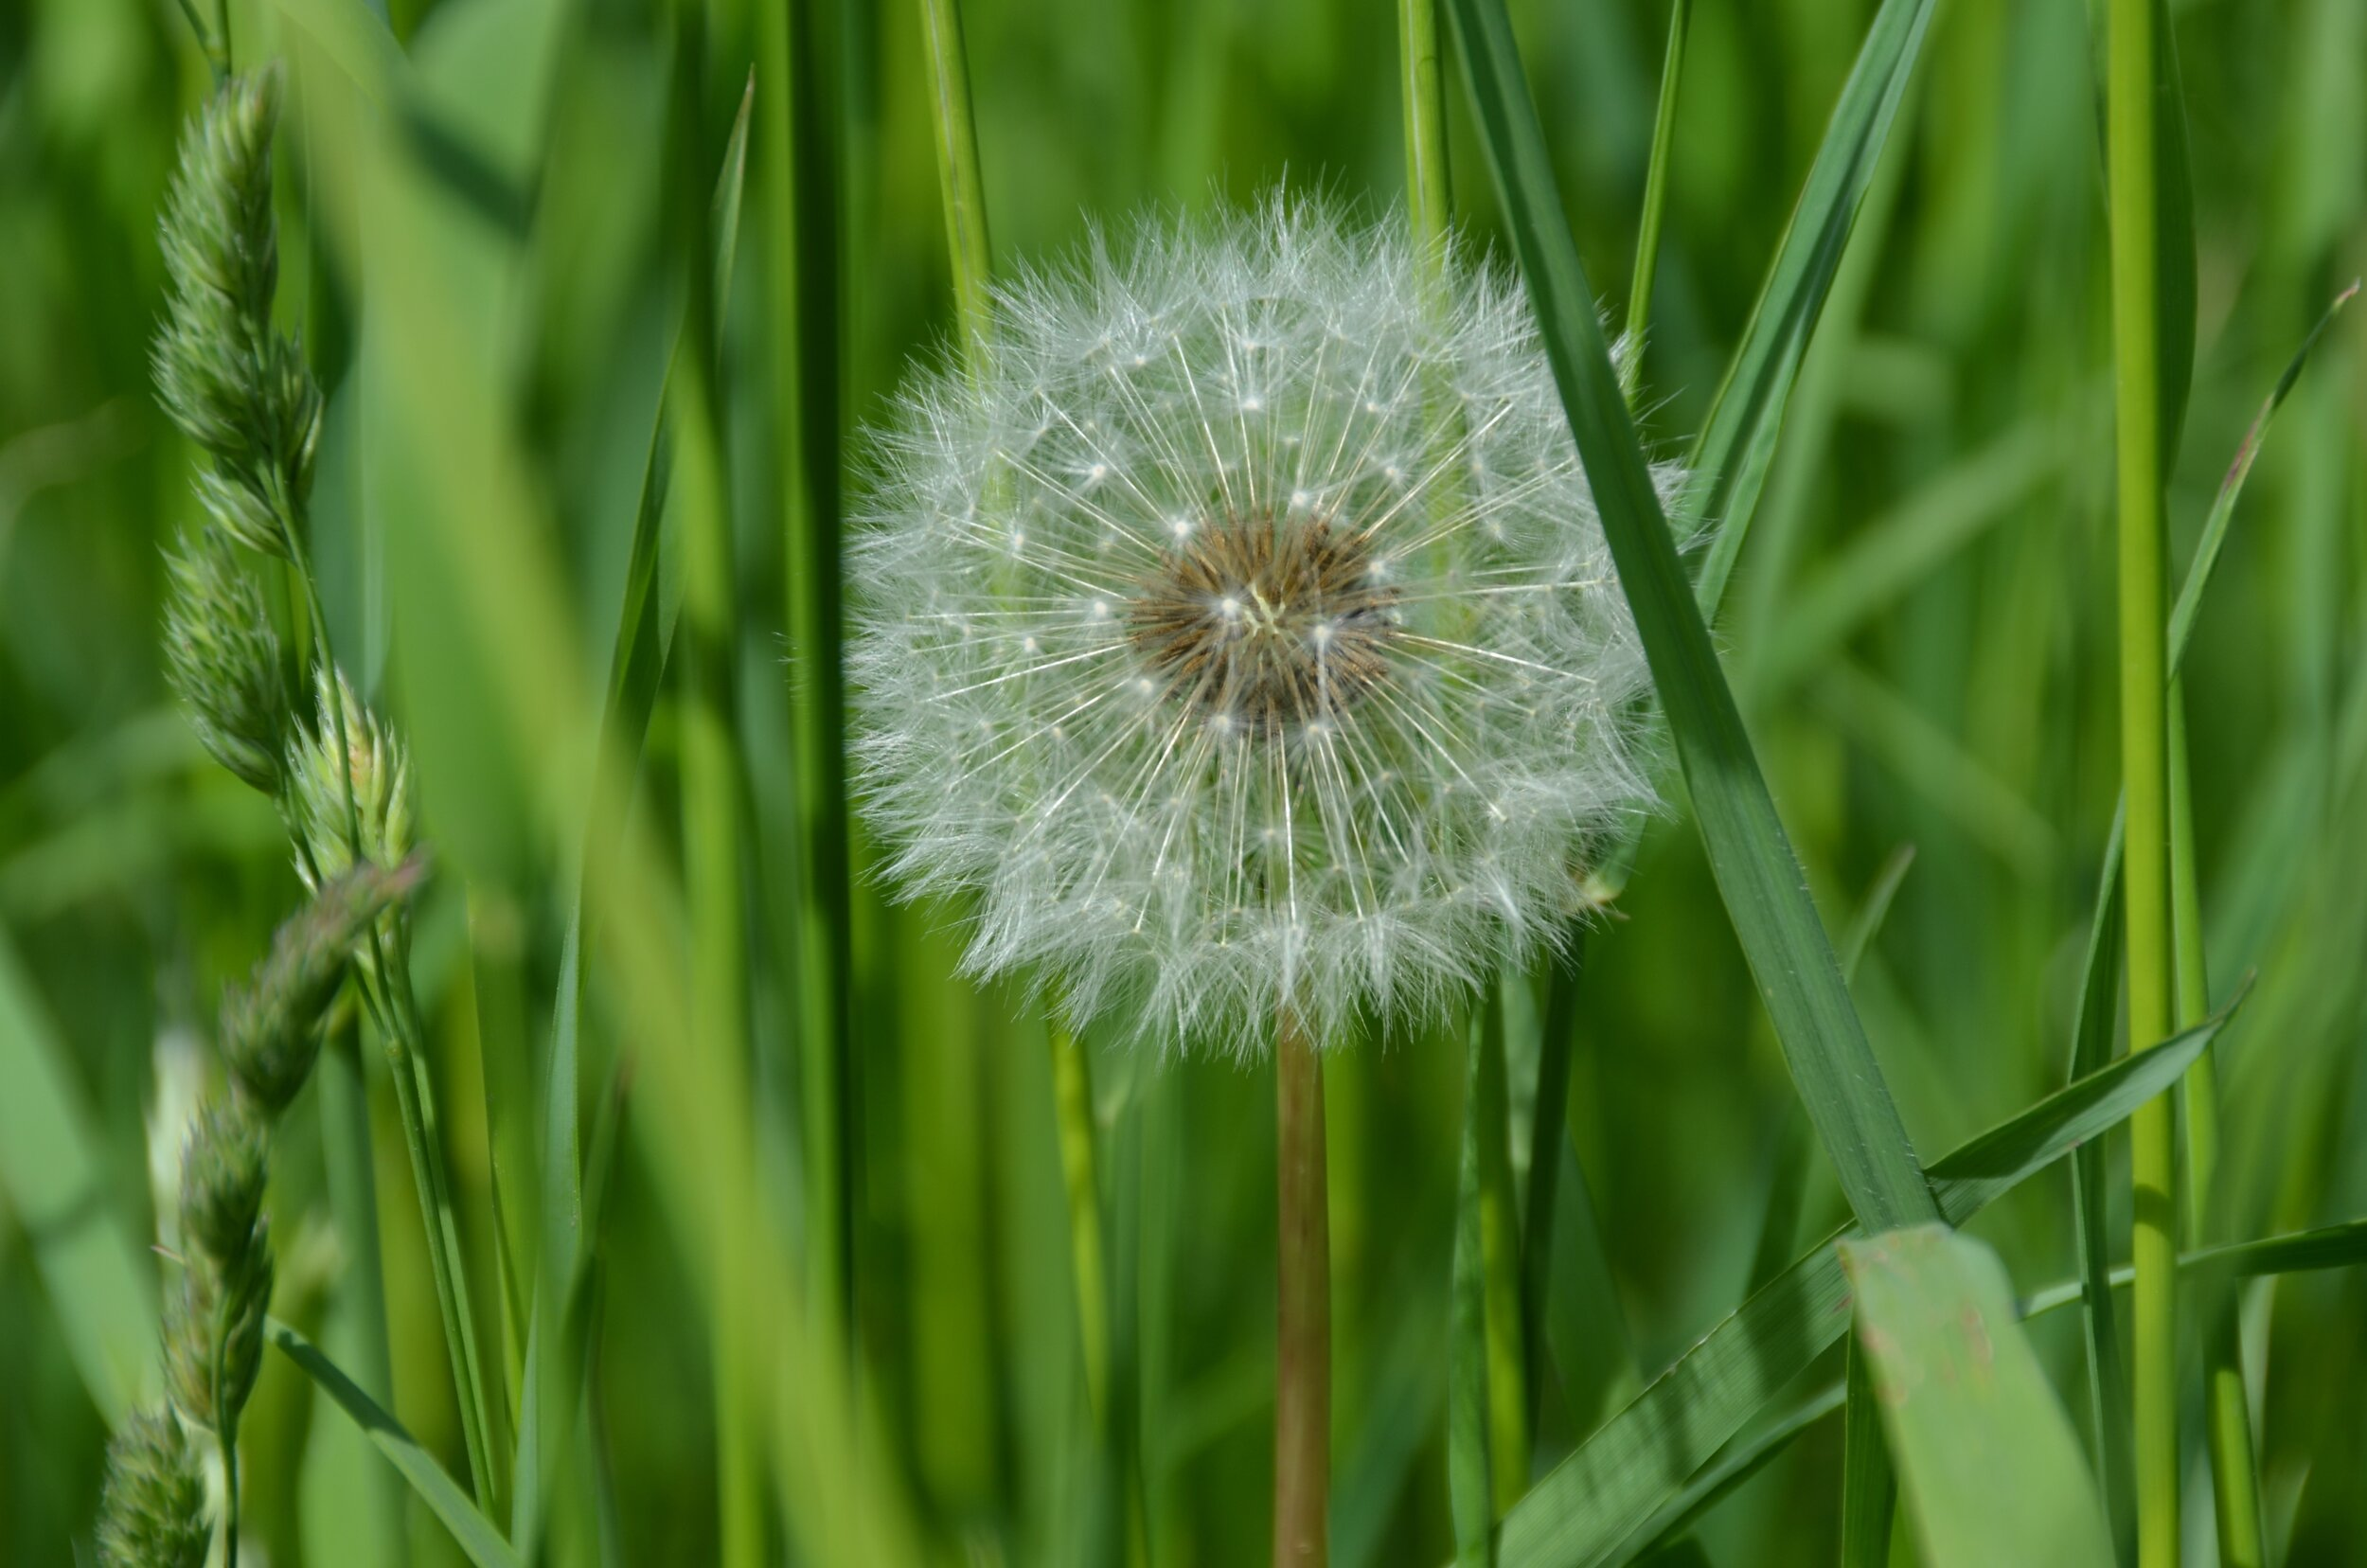 Riddle #3 - A dandelion